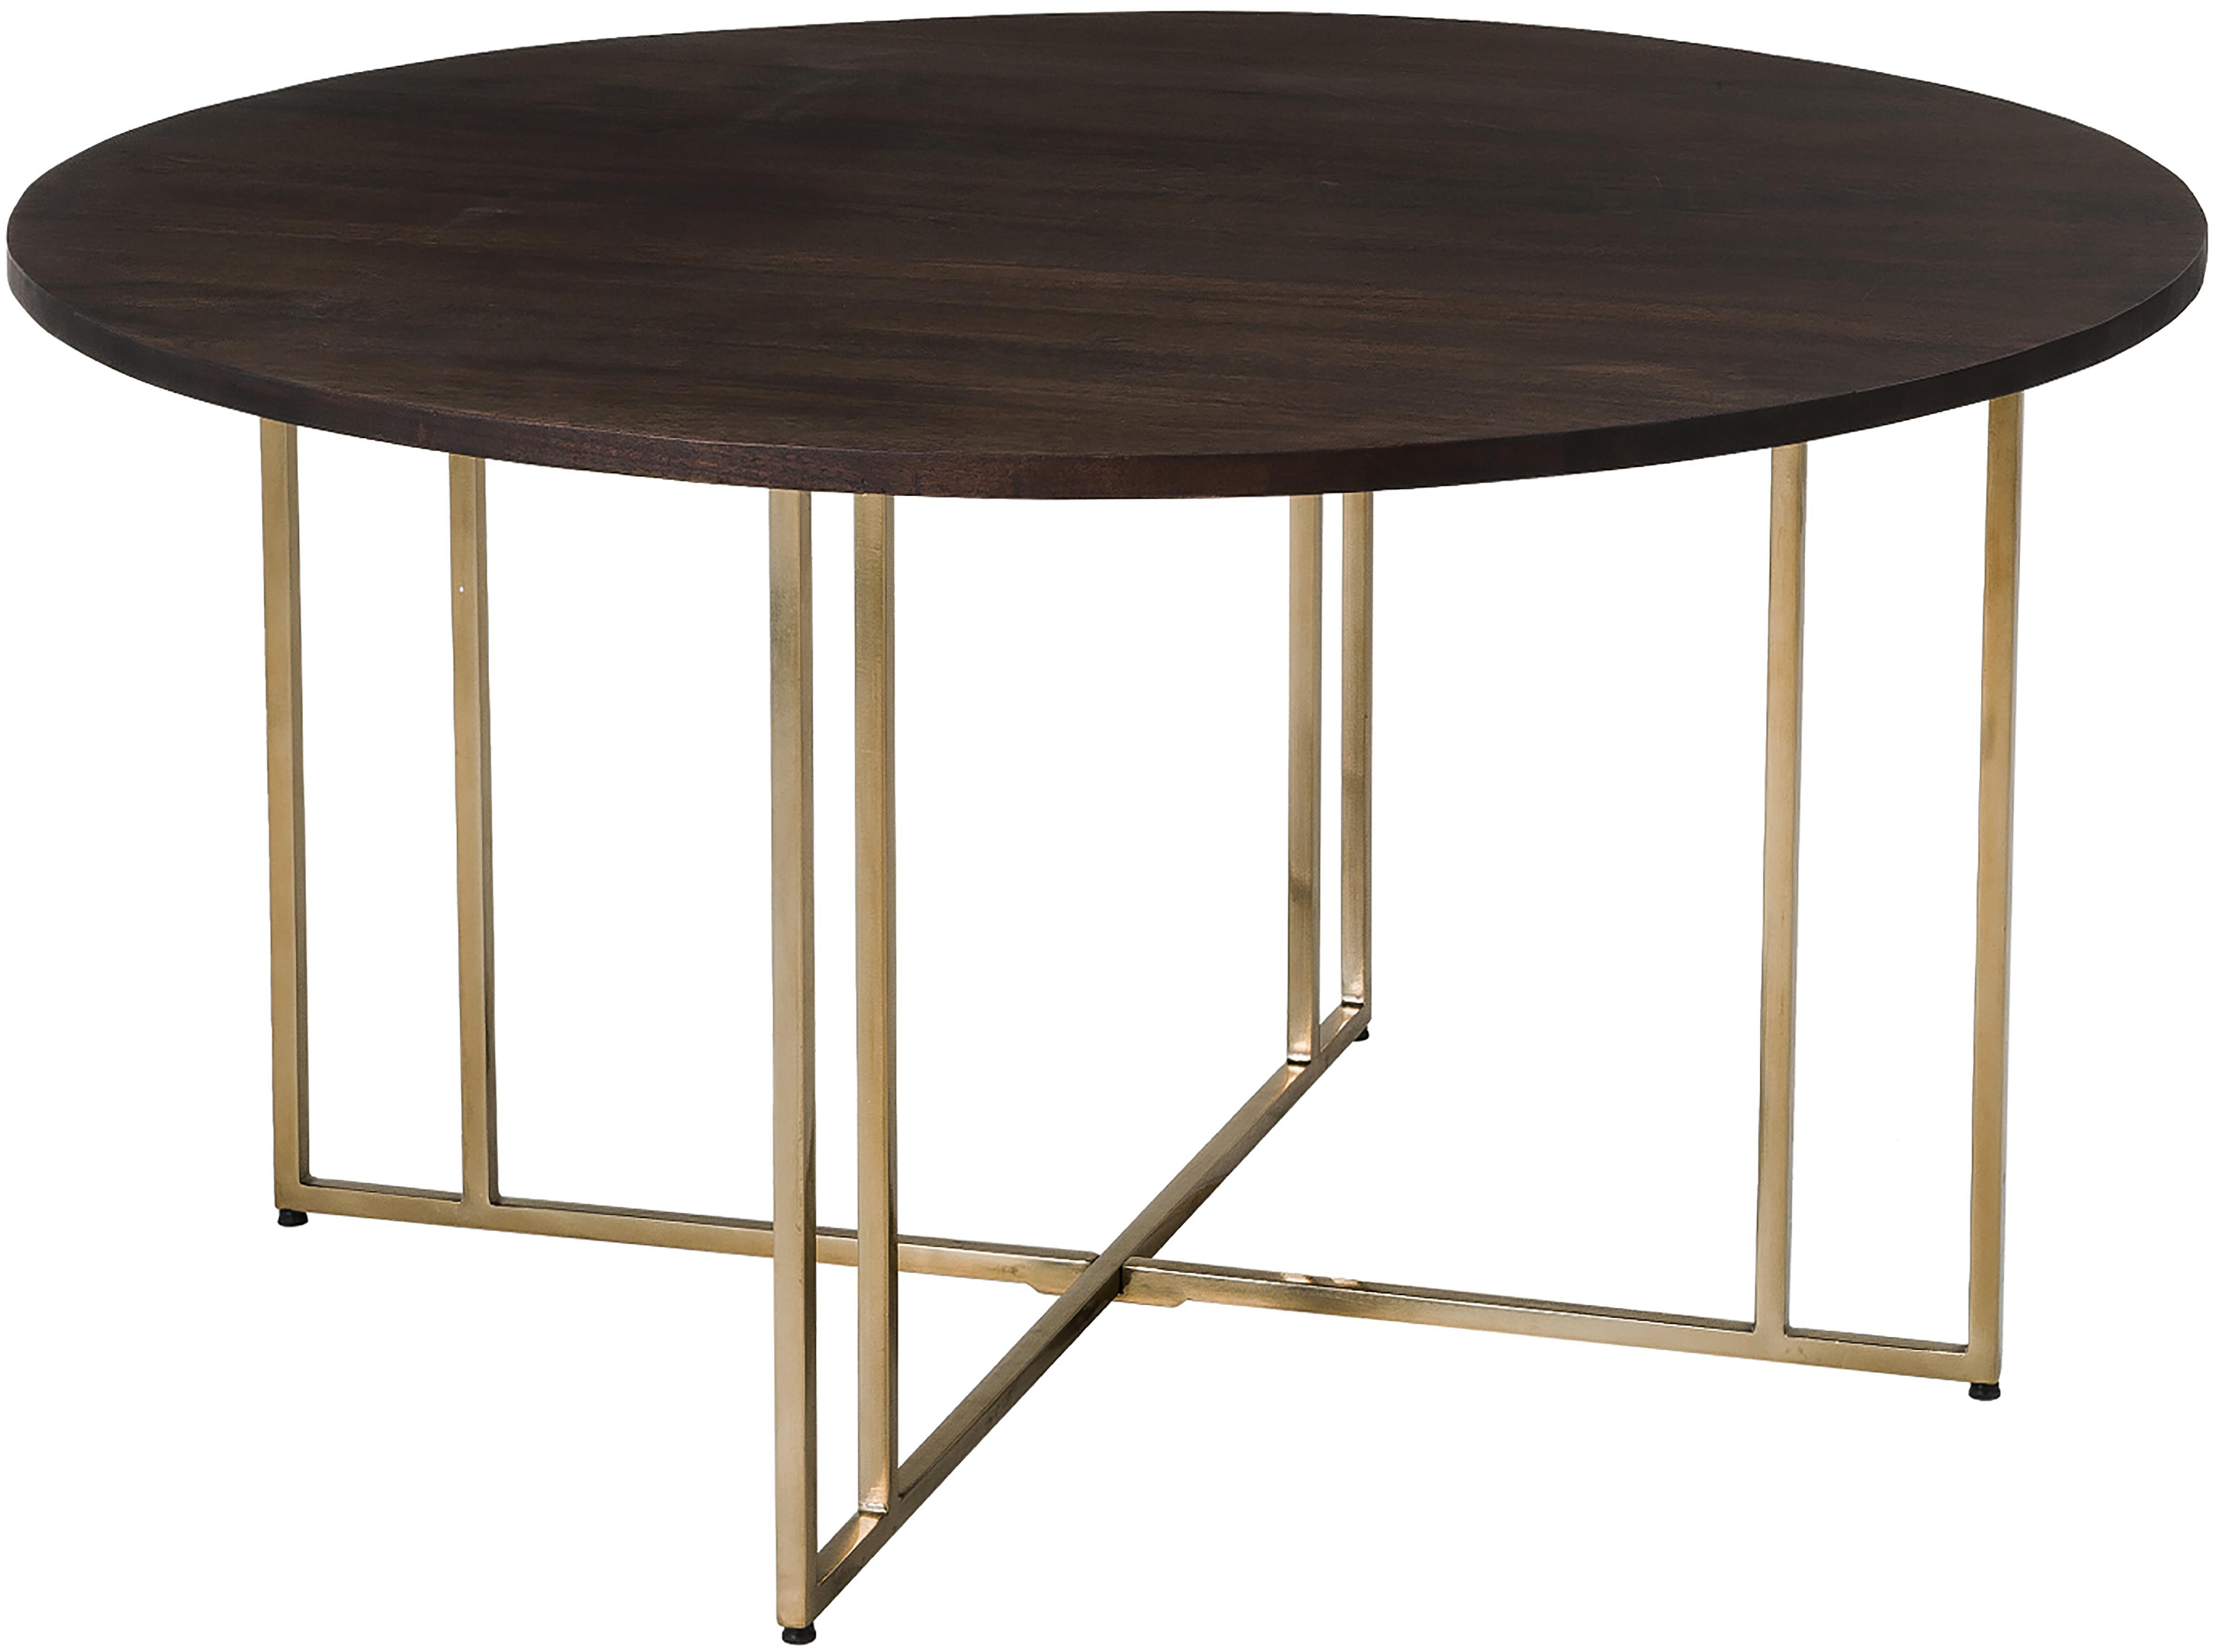 Mesa de comedor redonda de madera maciza Luca, Tablero: madera de mango, Estructura: metal, recubierto, Madera oscura, dorado, Ø 140 x Al 75 cm